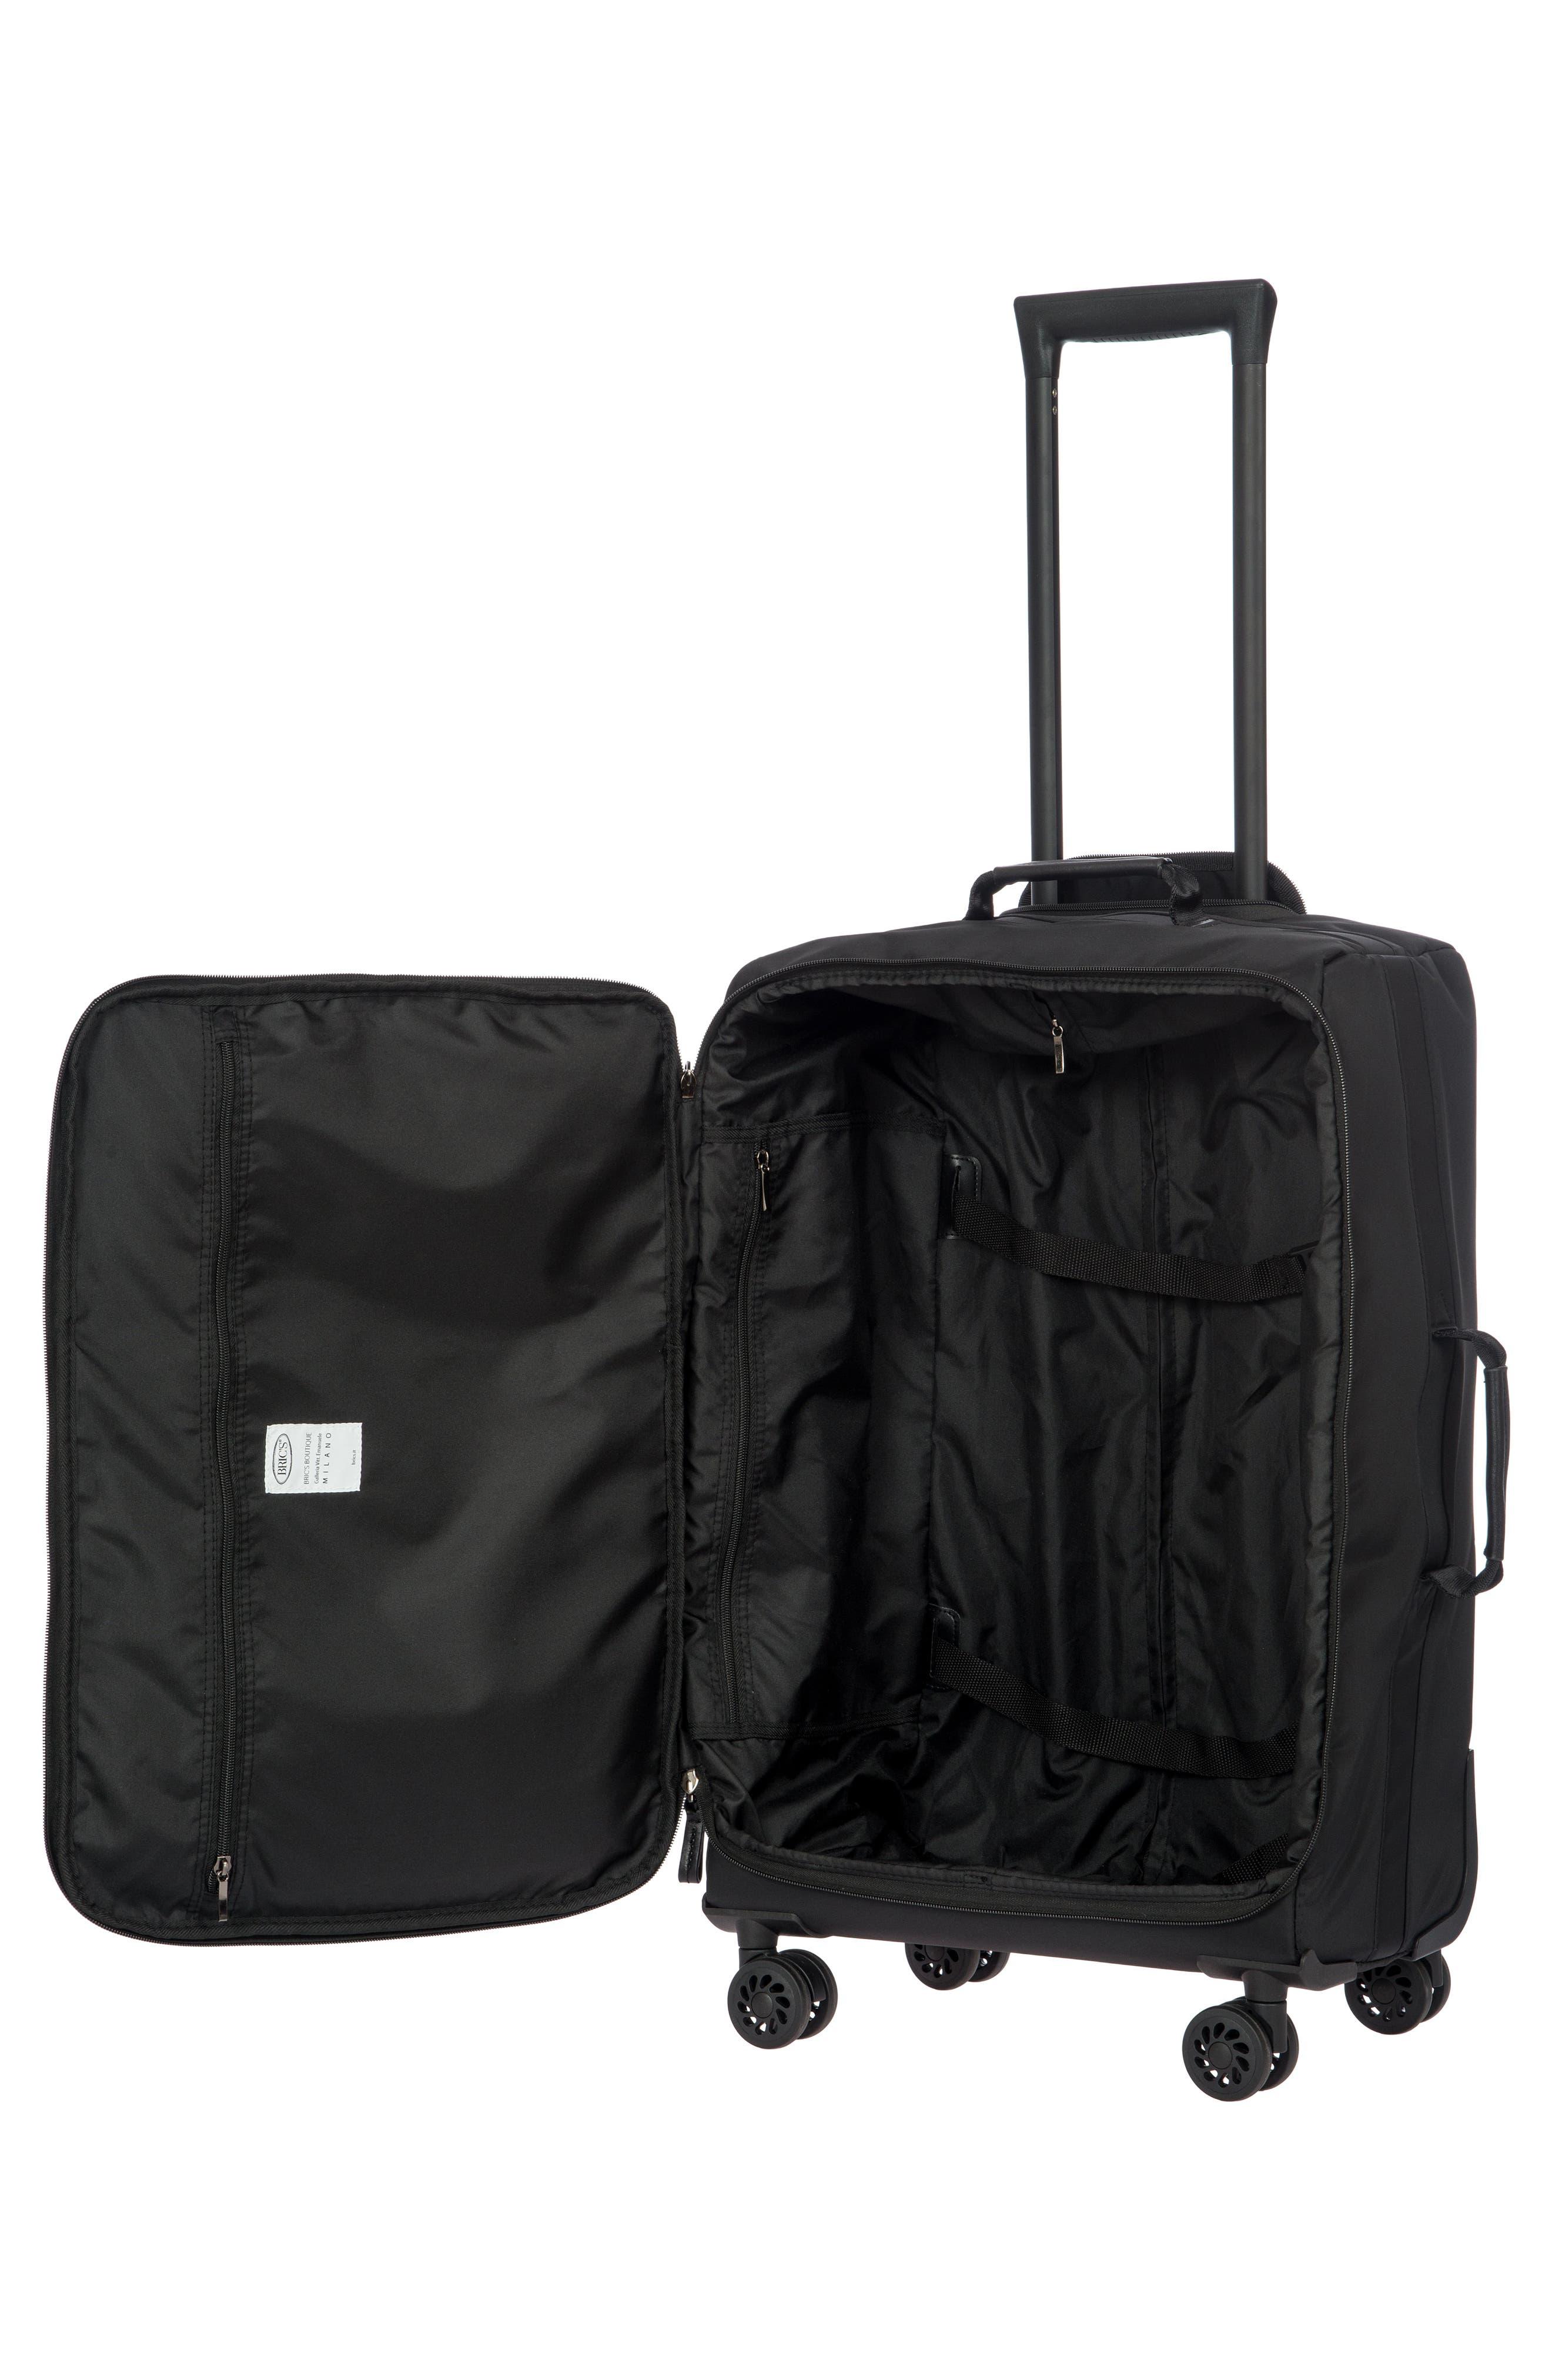 X-Bag 25-Inch Spinner Suitcase,                             Alternate thumbnail 2, color,                             BLACK/ BLACK